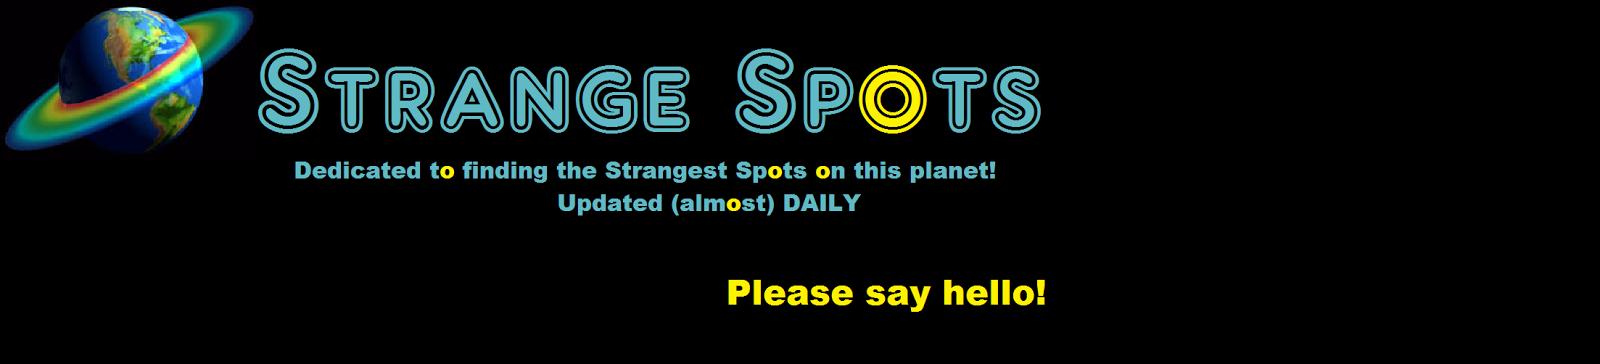 strange spots